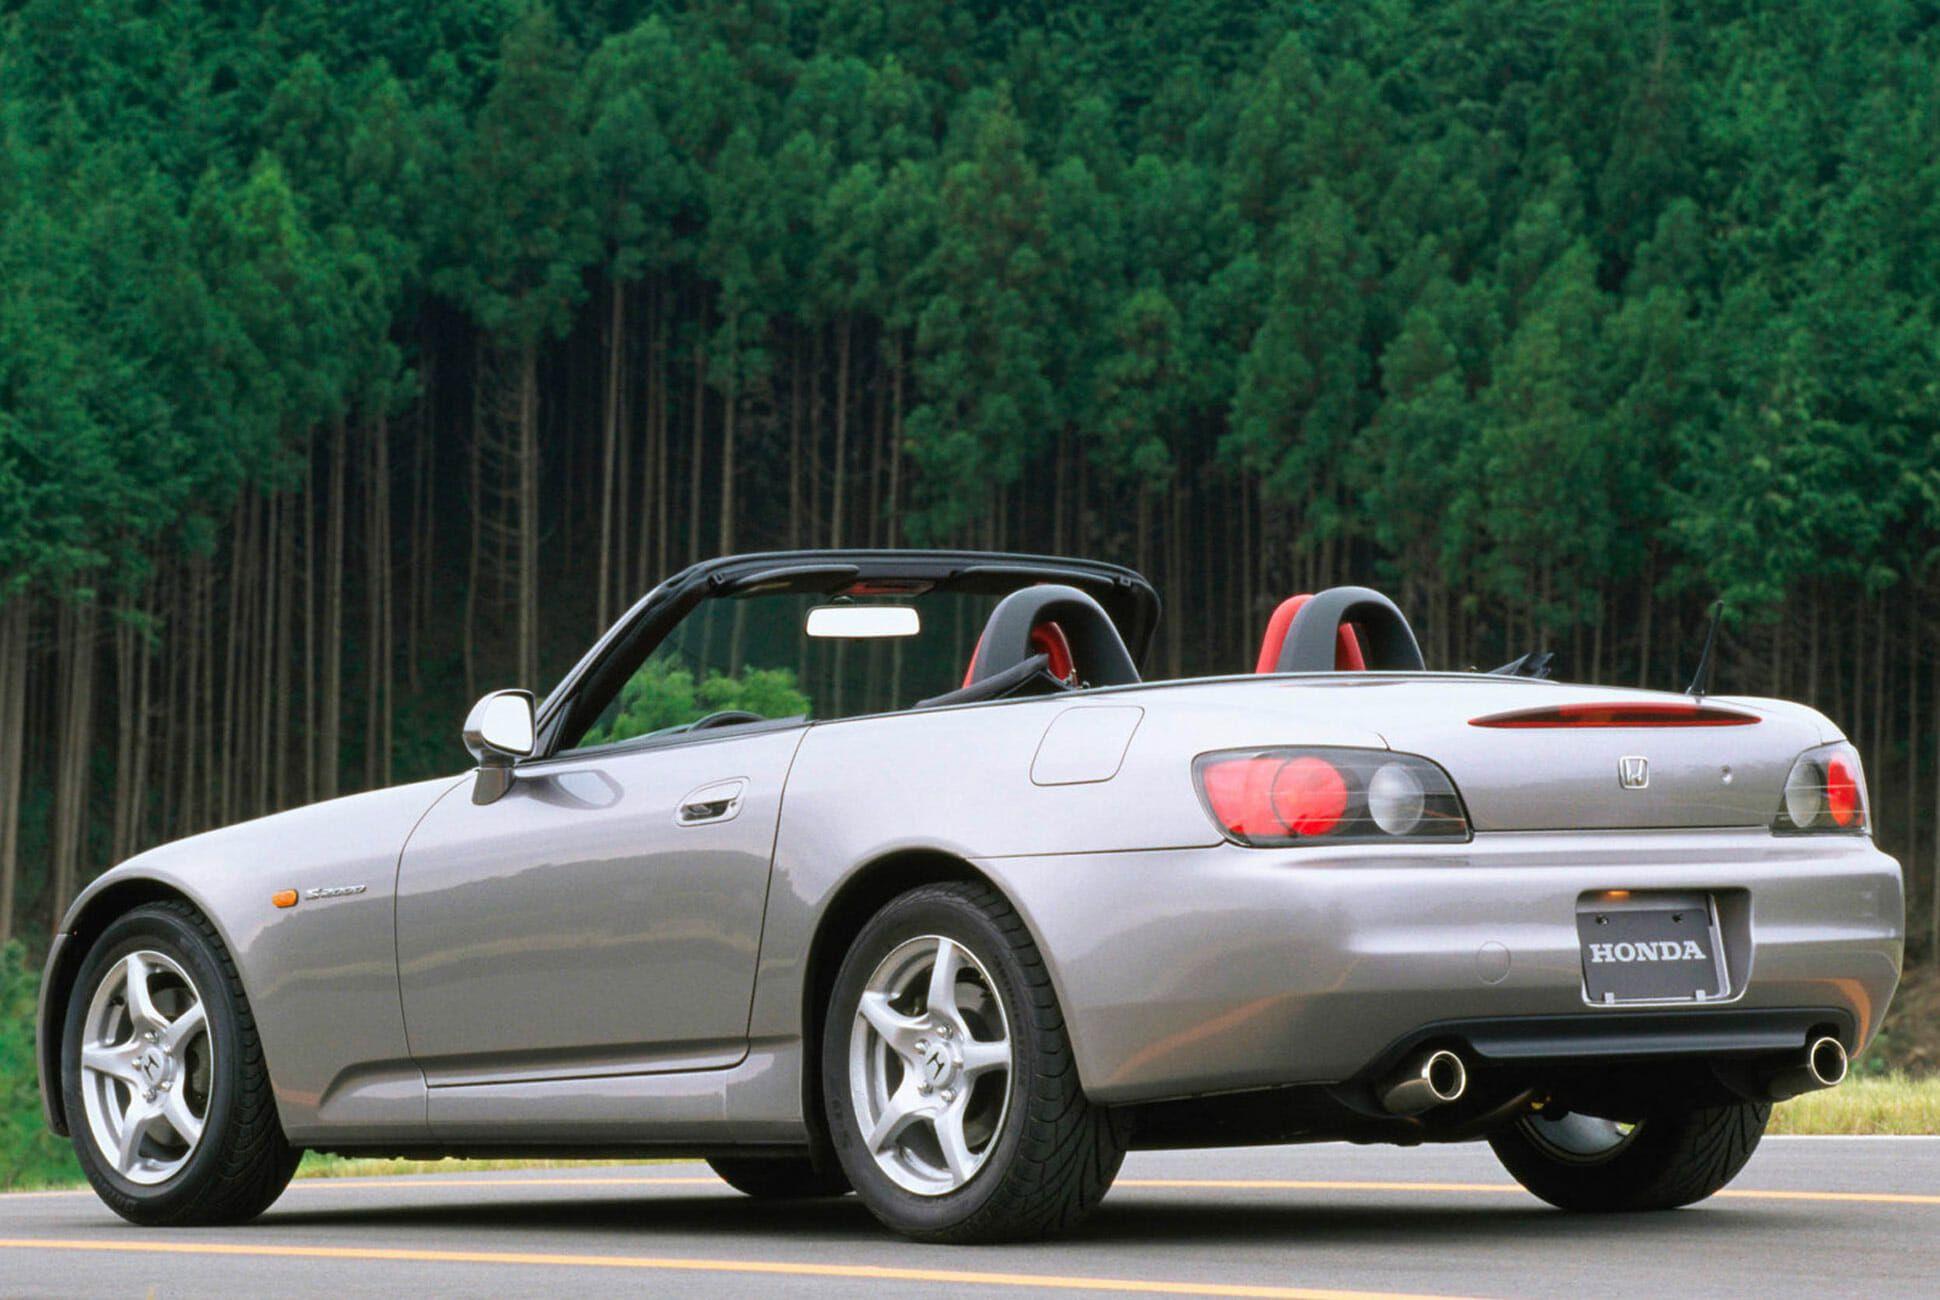 Affordable-Dream-Car-S2000-gear-patrol-slide-3